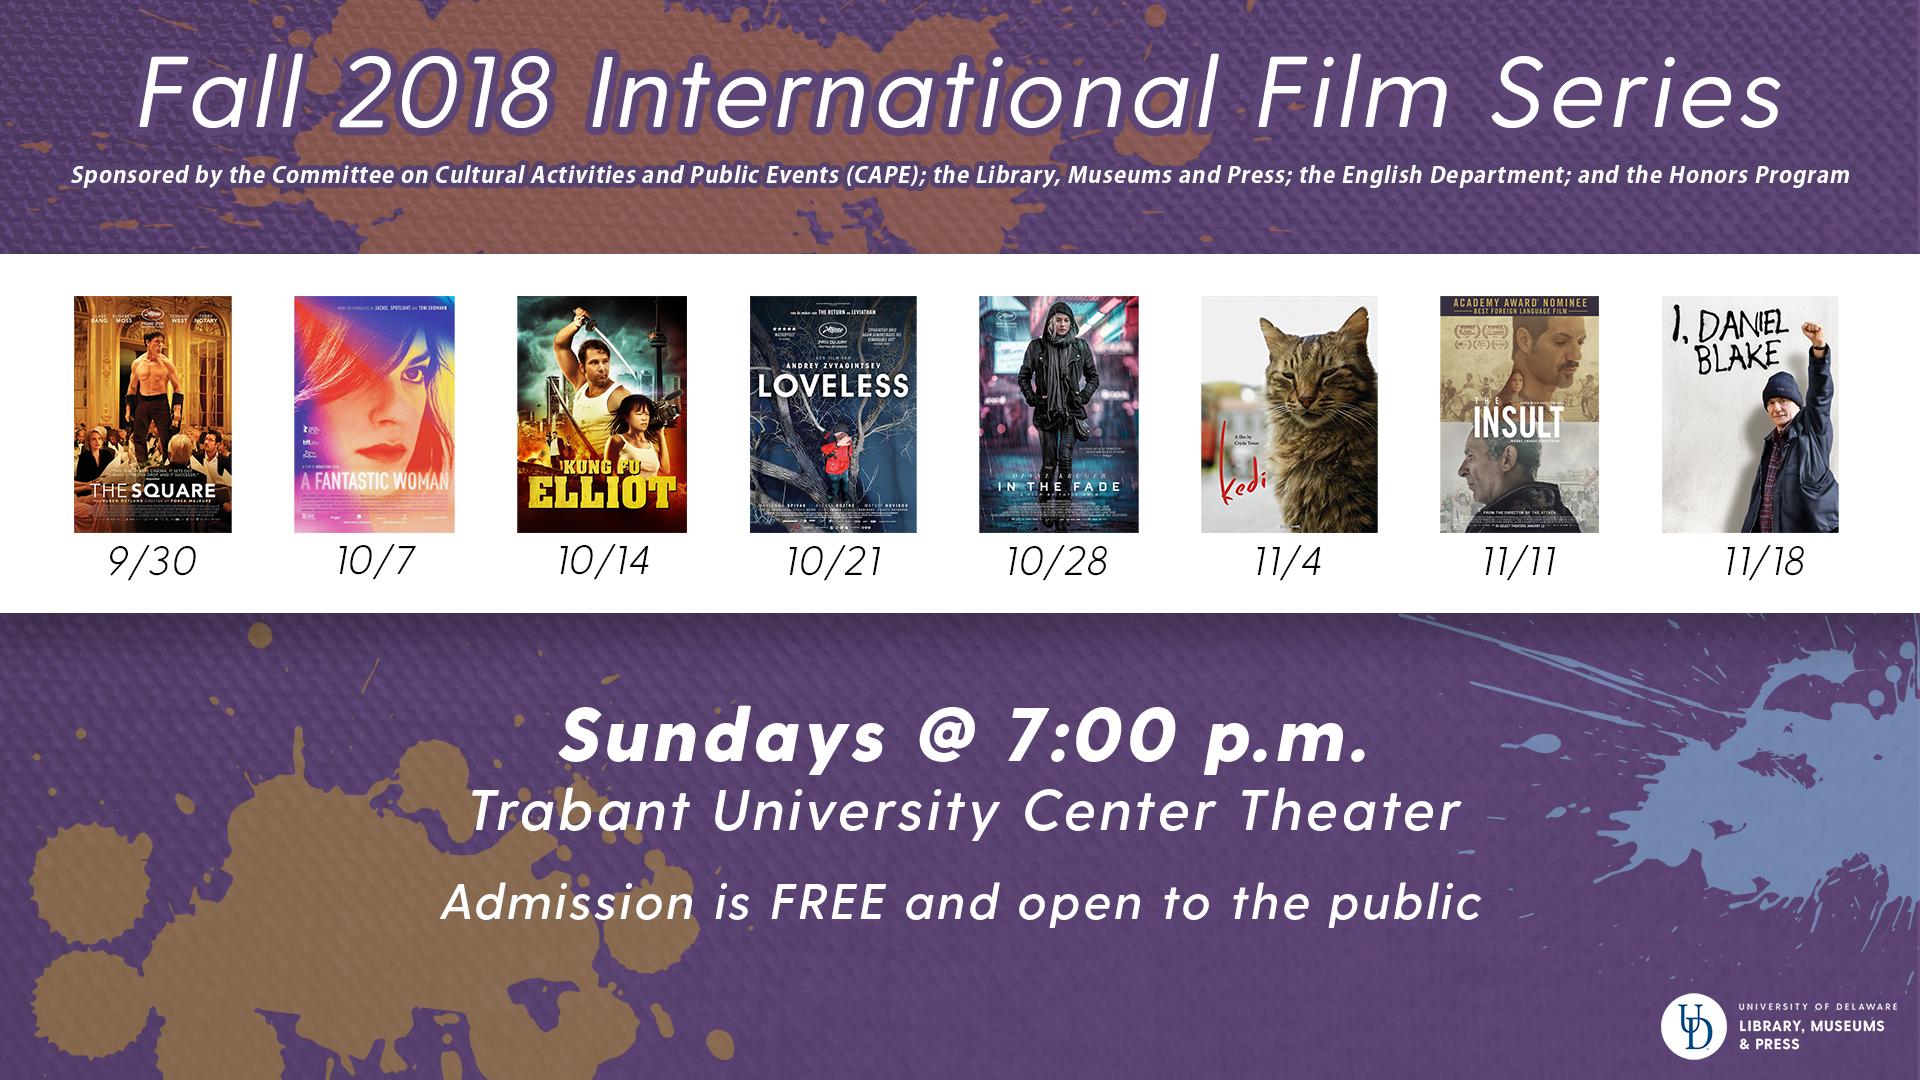 Fall 2018 International Film Series